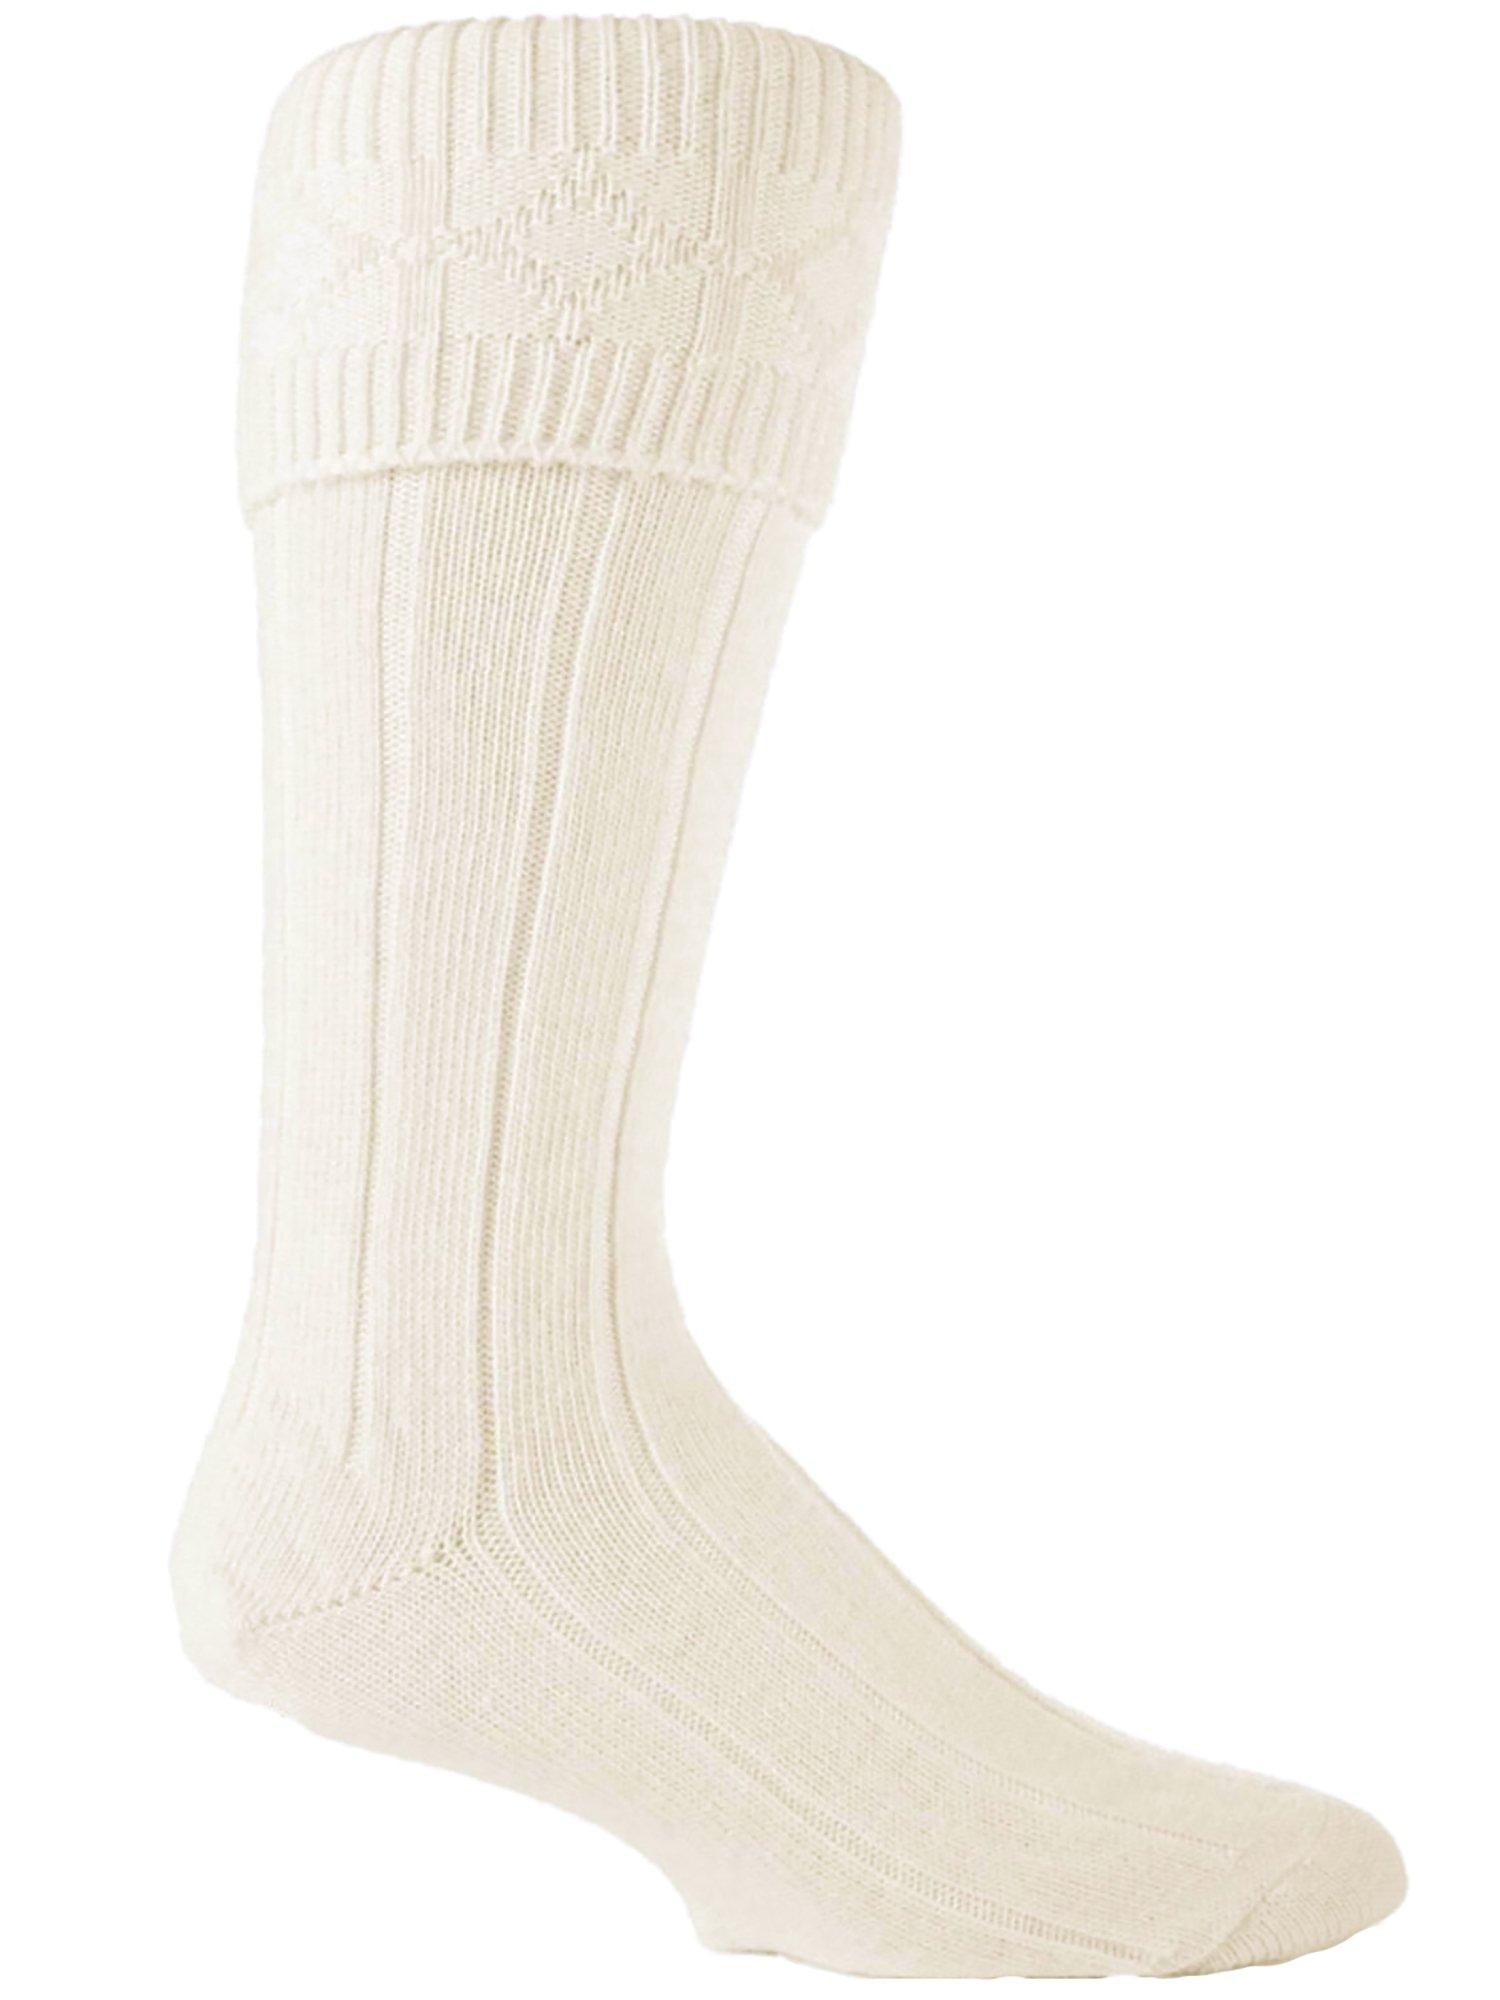 1 Pairs Mens wool Rich wedding ceremonial Scottish Cream Kilt Socks 7-12 us